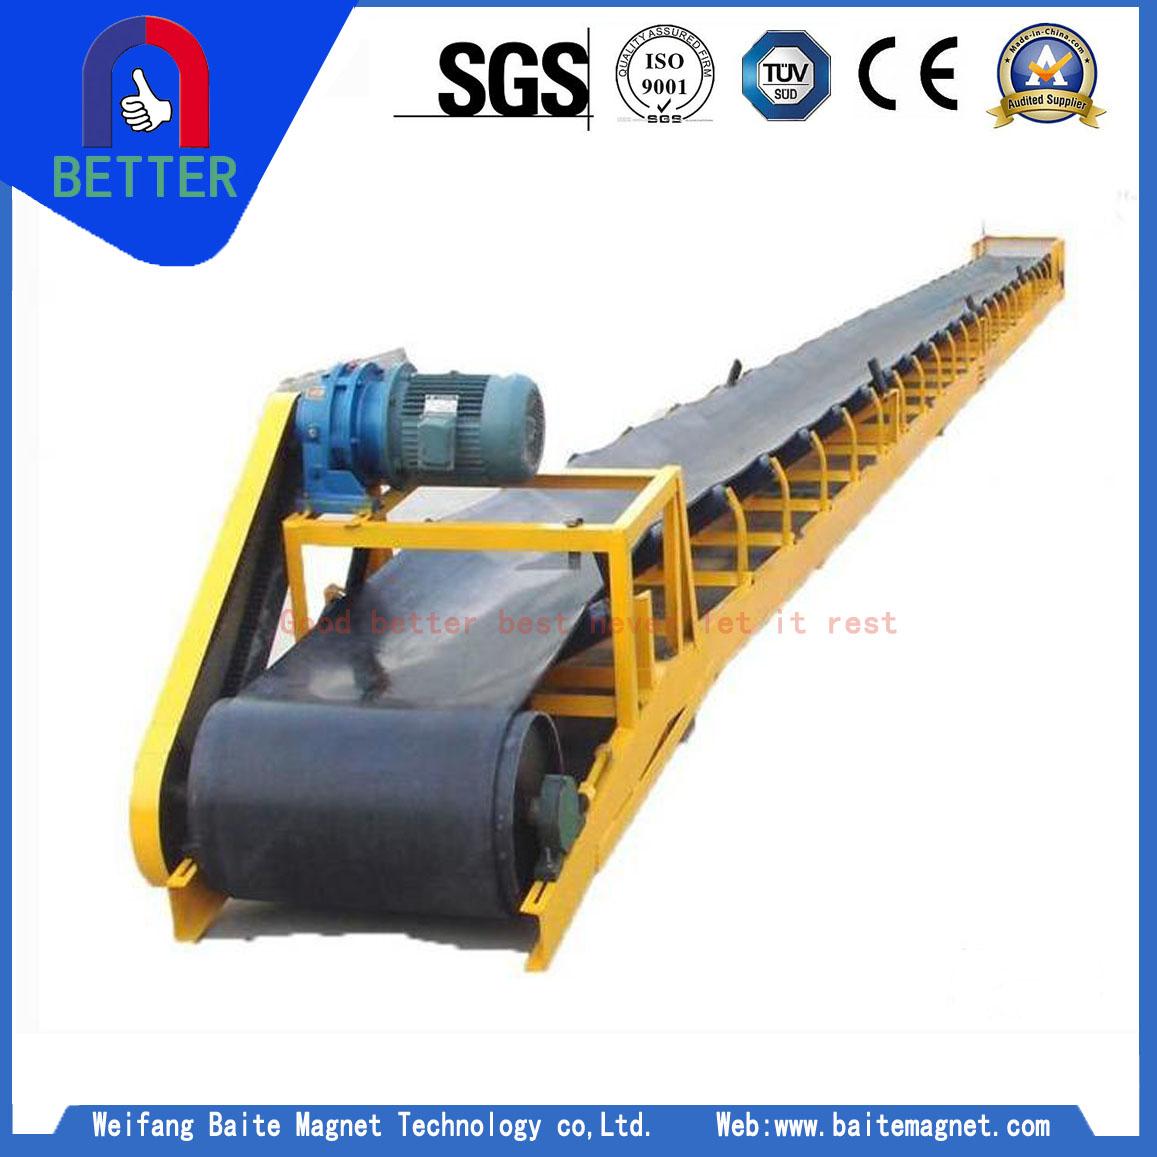 TD75 Belt Conveyor Manufacturers In Vietnam - Baite Magnet Technology